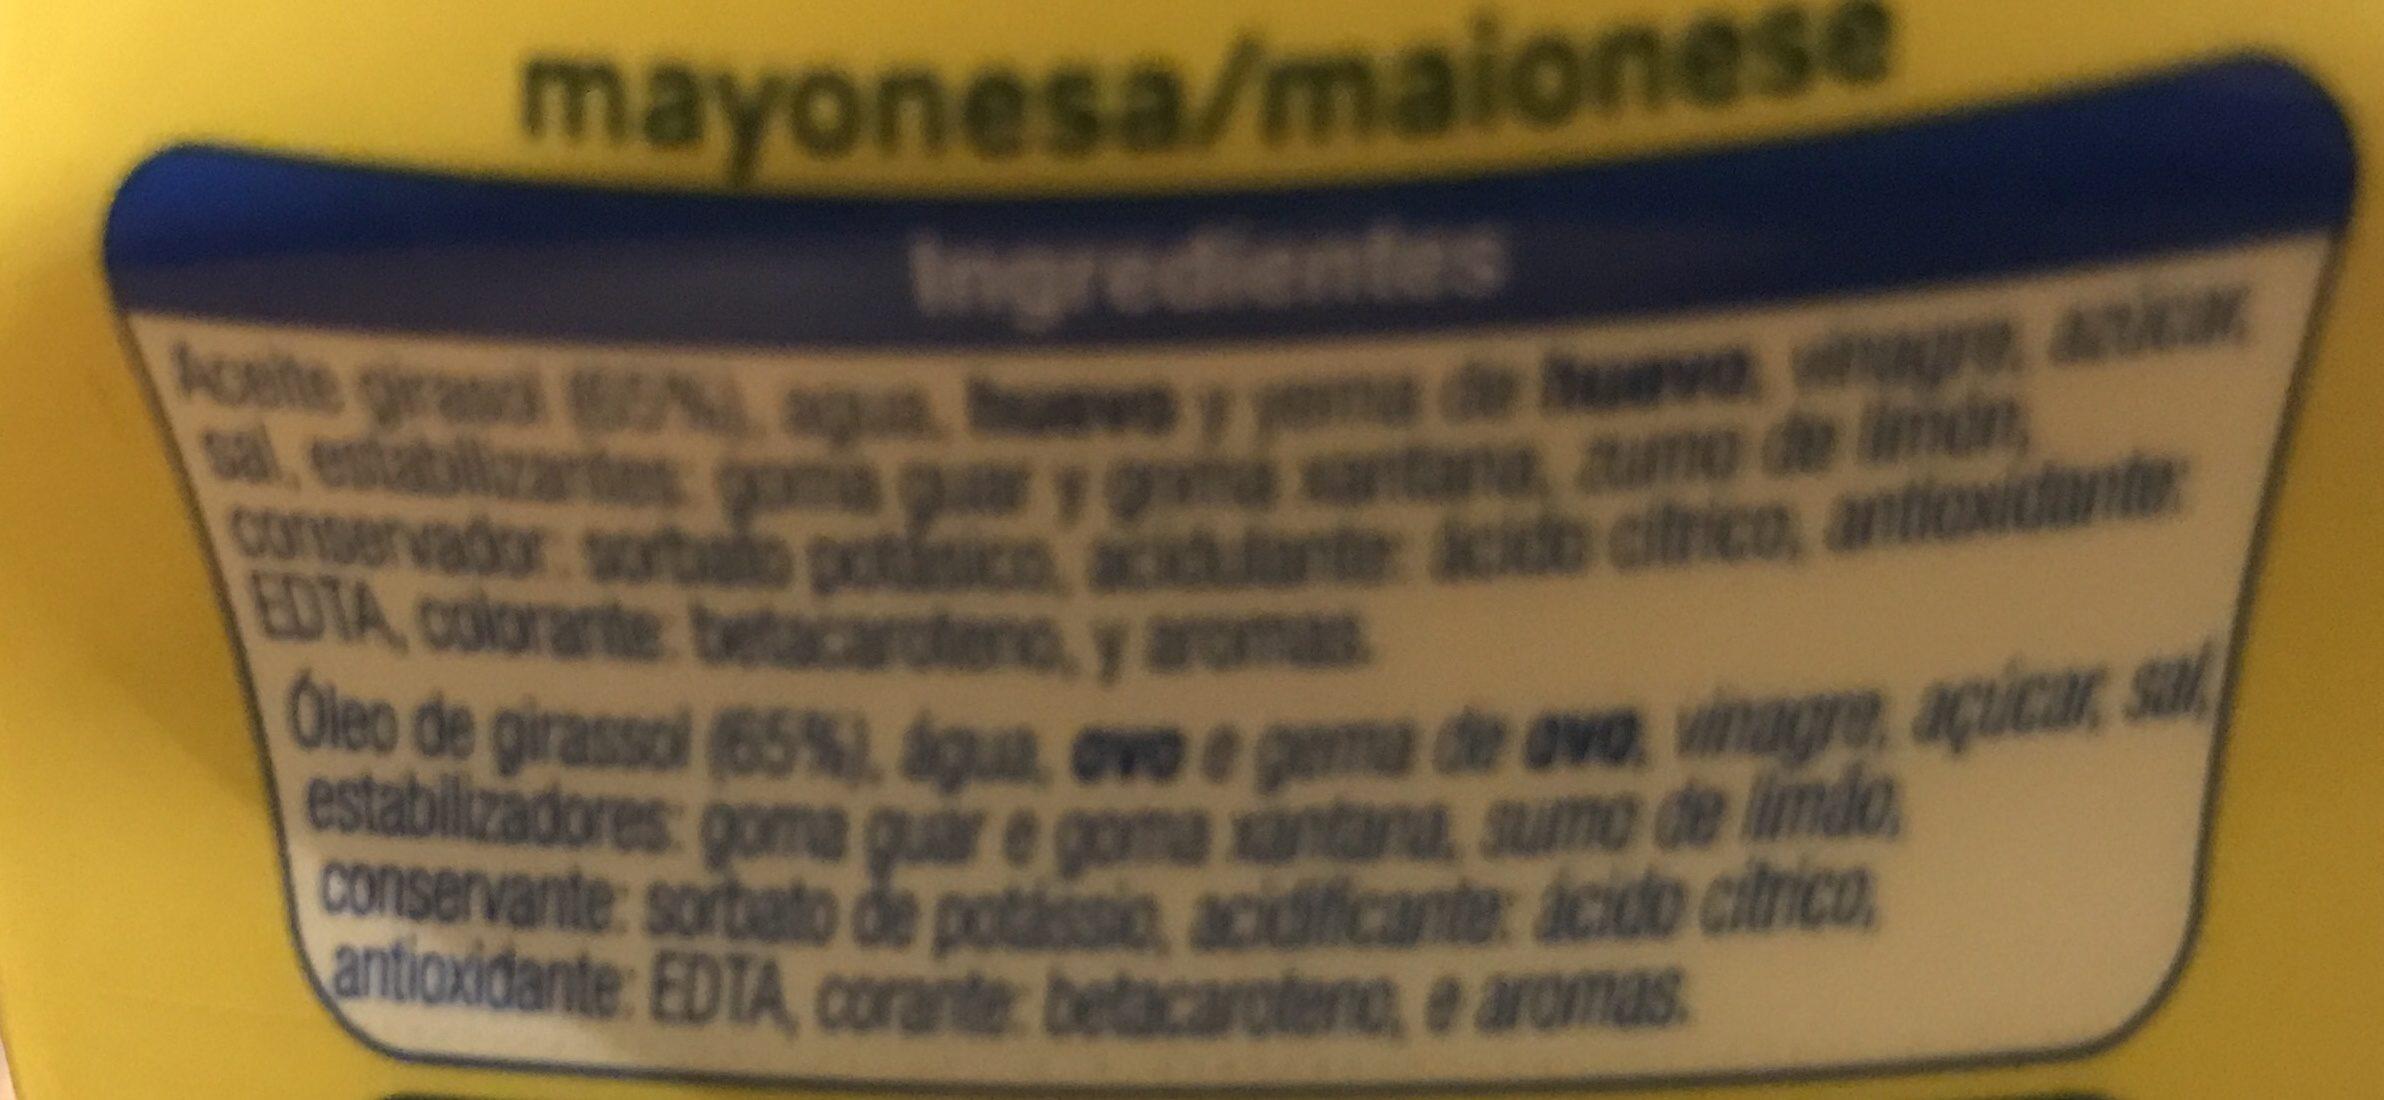 Mayonesa - Ingrédients - fr